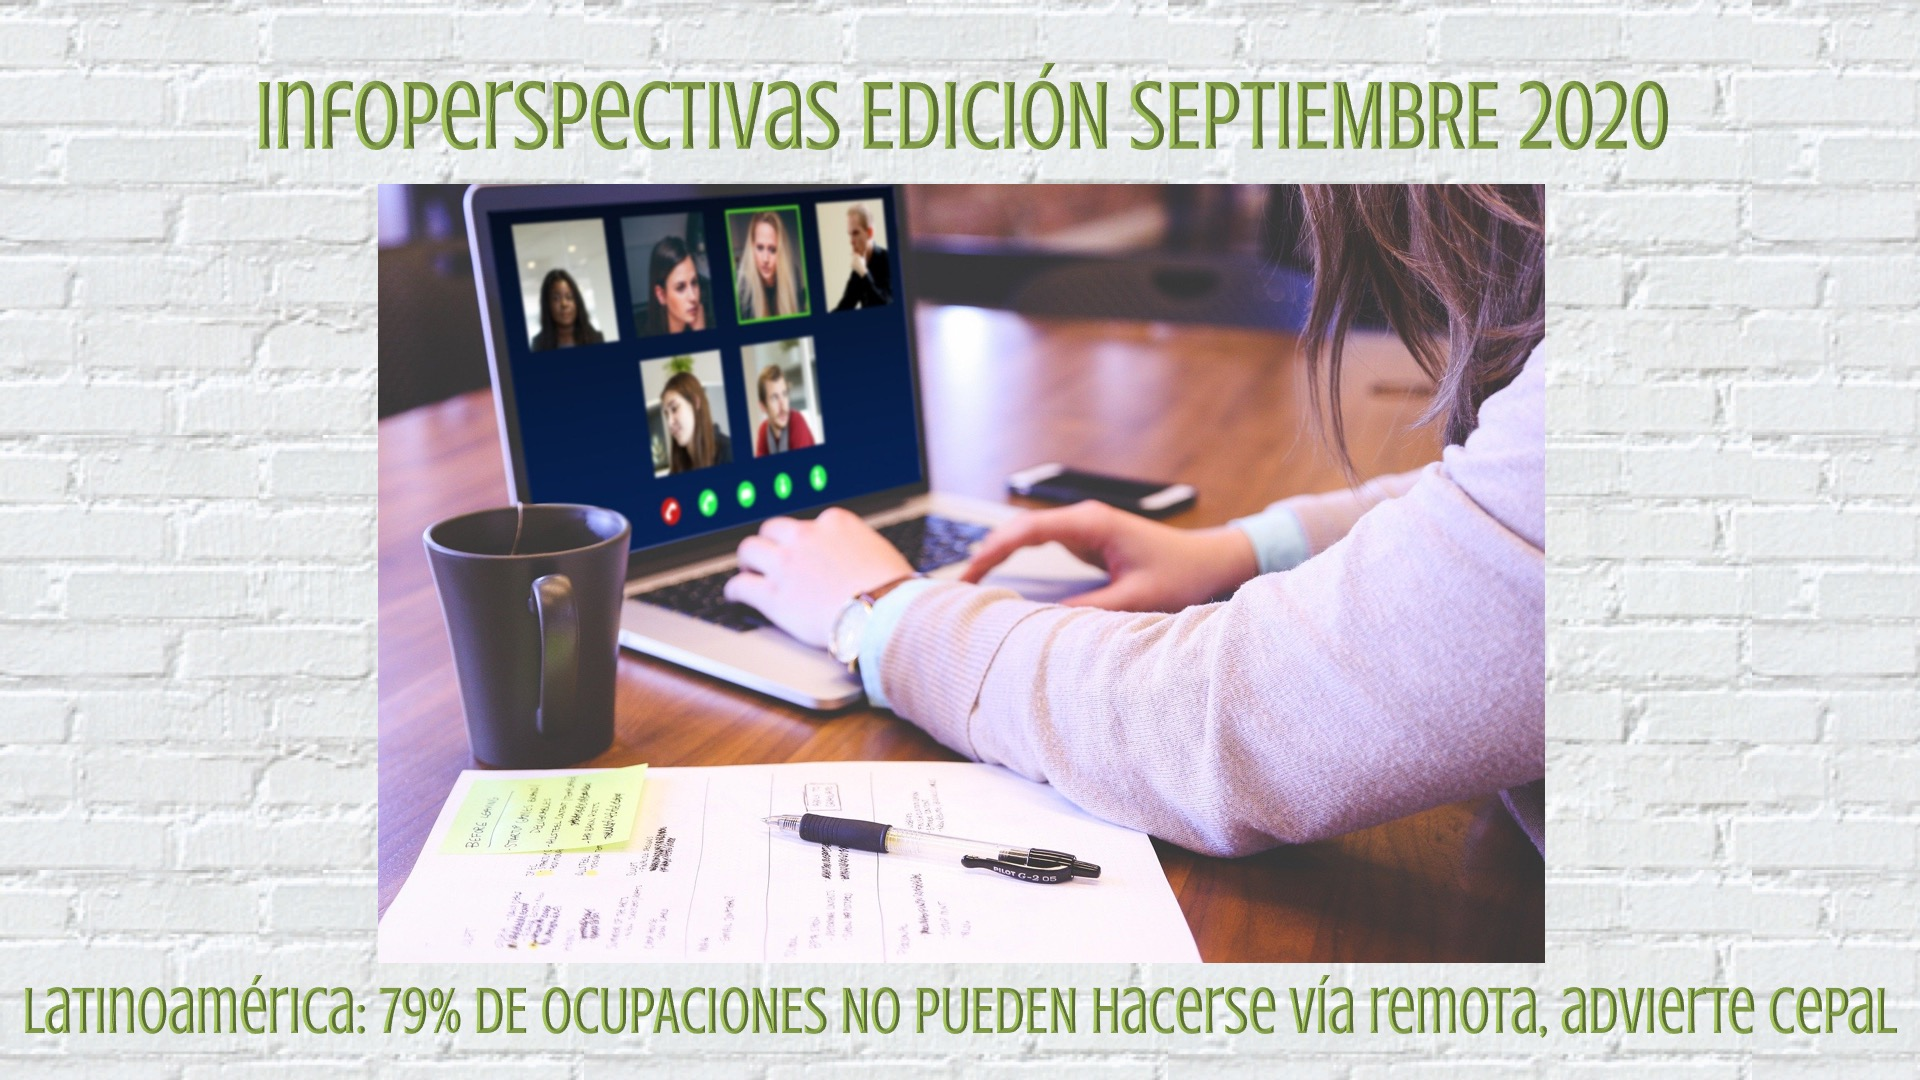 infoPerspectivas TribuAmericas Septiembre 2020